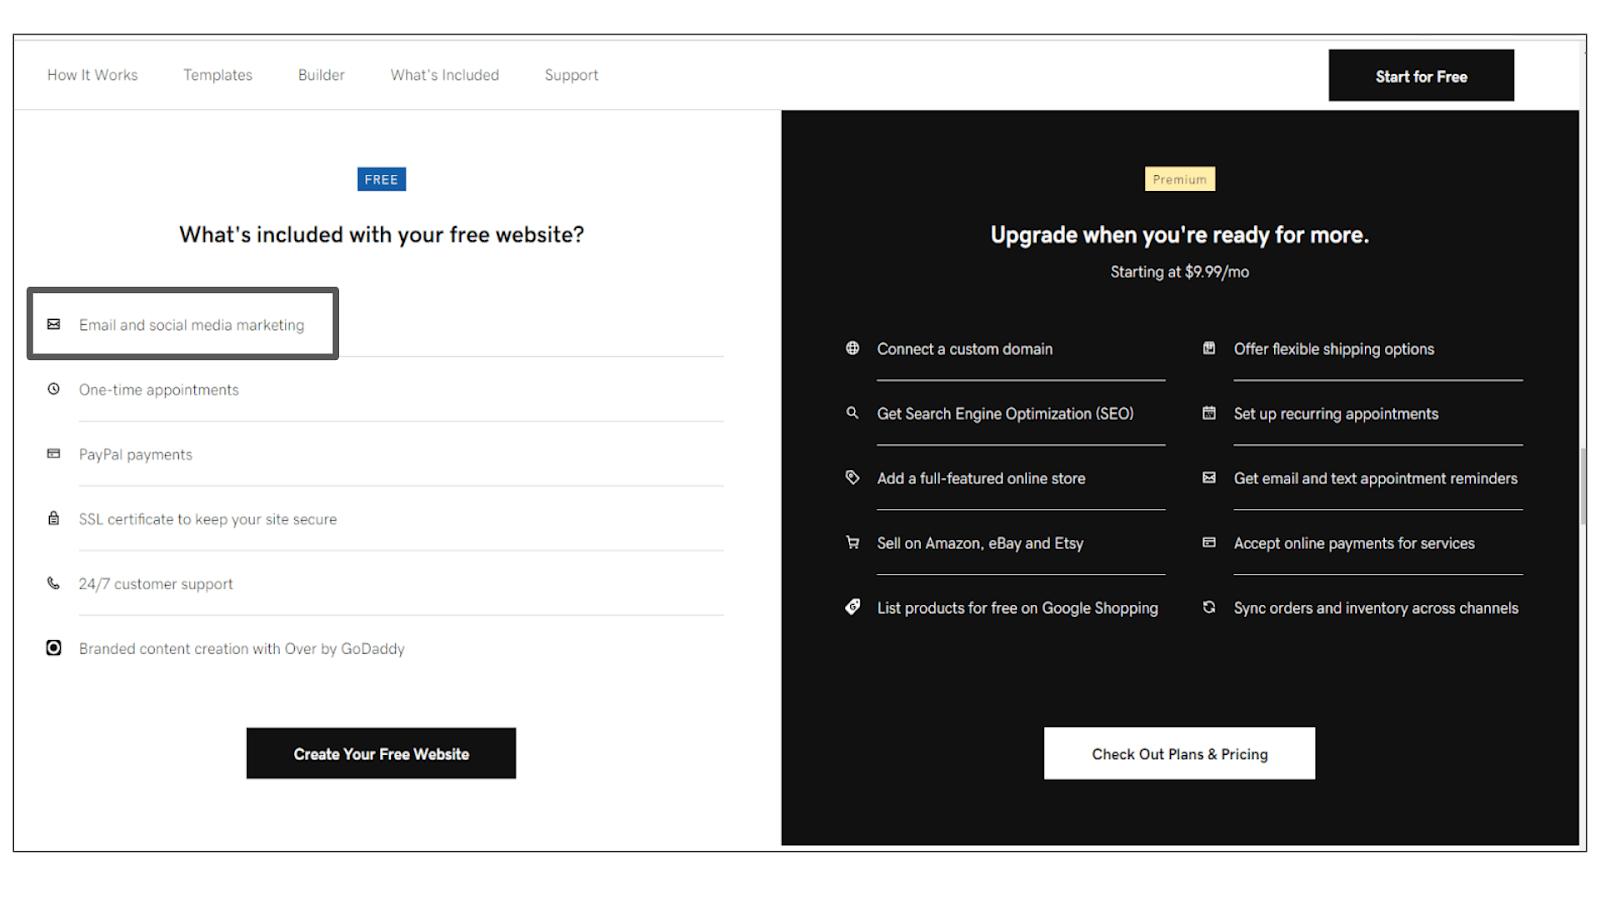 GoDaddy Websites + Marketing features